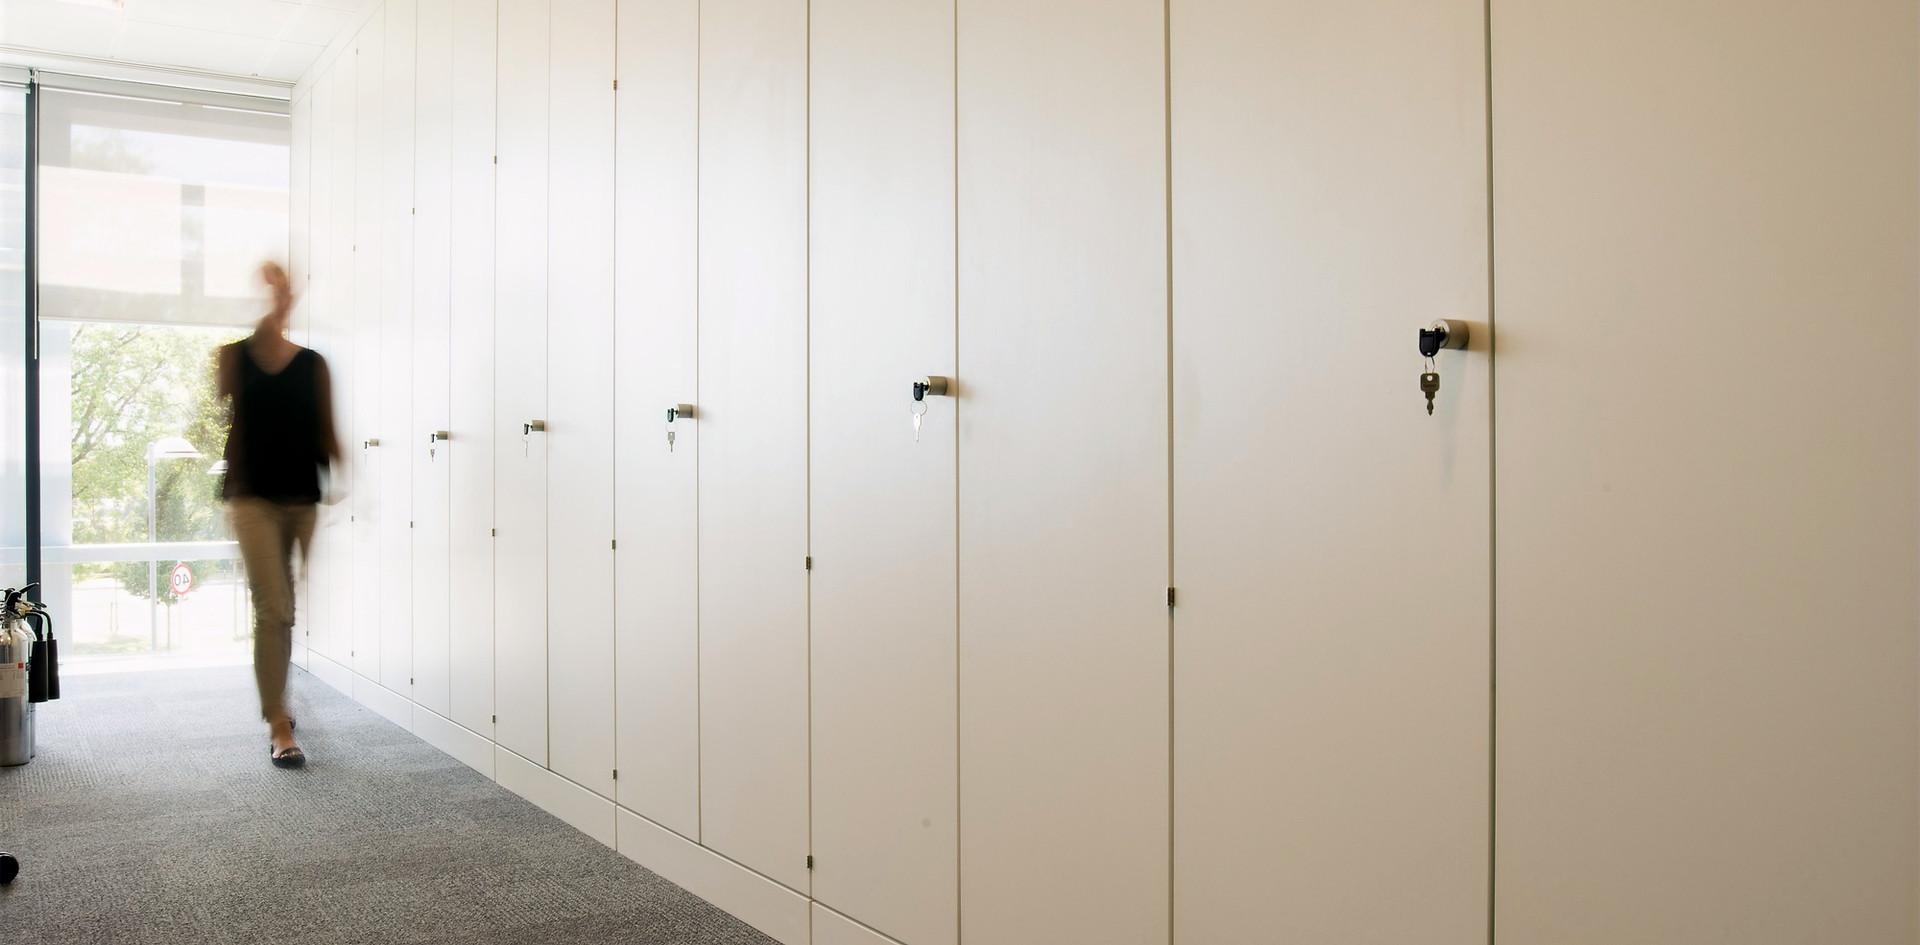 storagewall tallwall